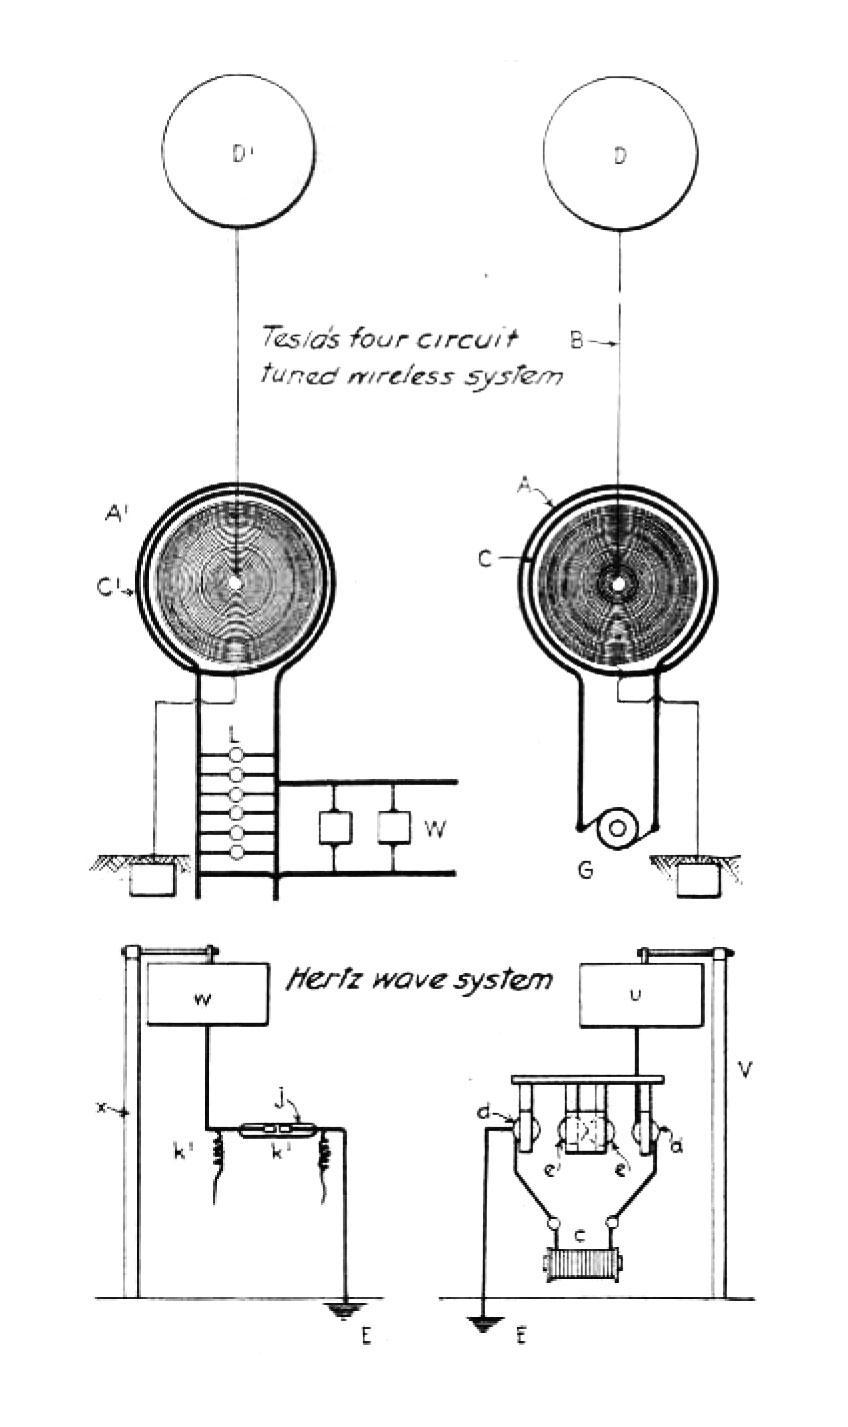 diagram of tesla s four circuit tuned system [ 848 x 1427 Pixel ]